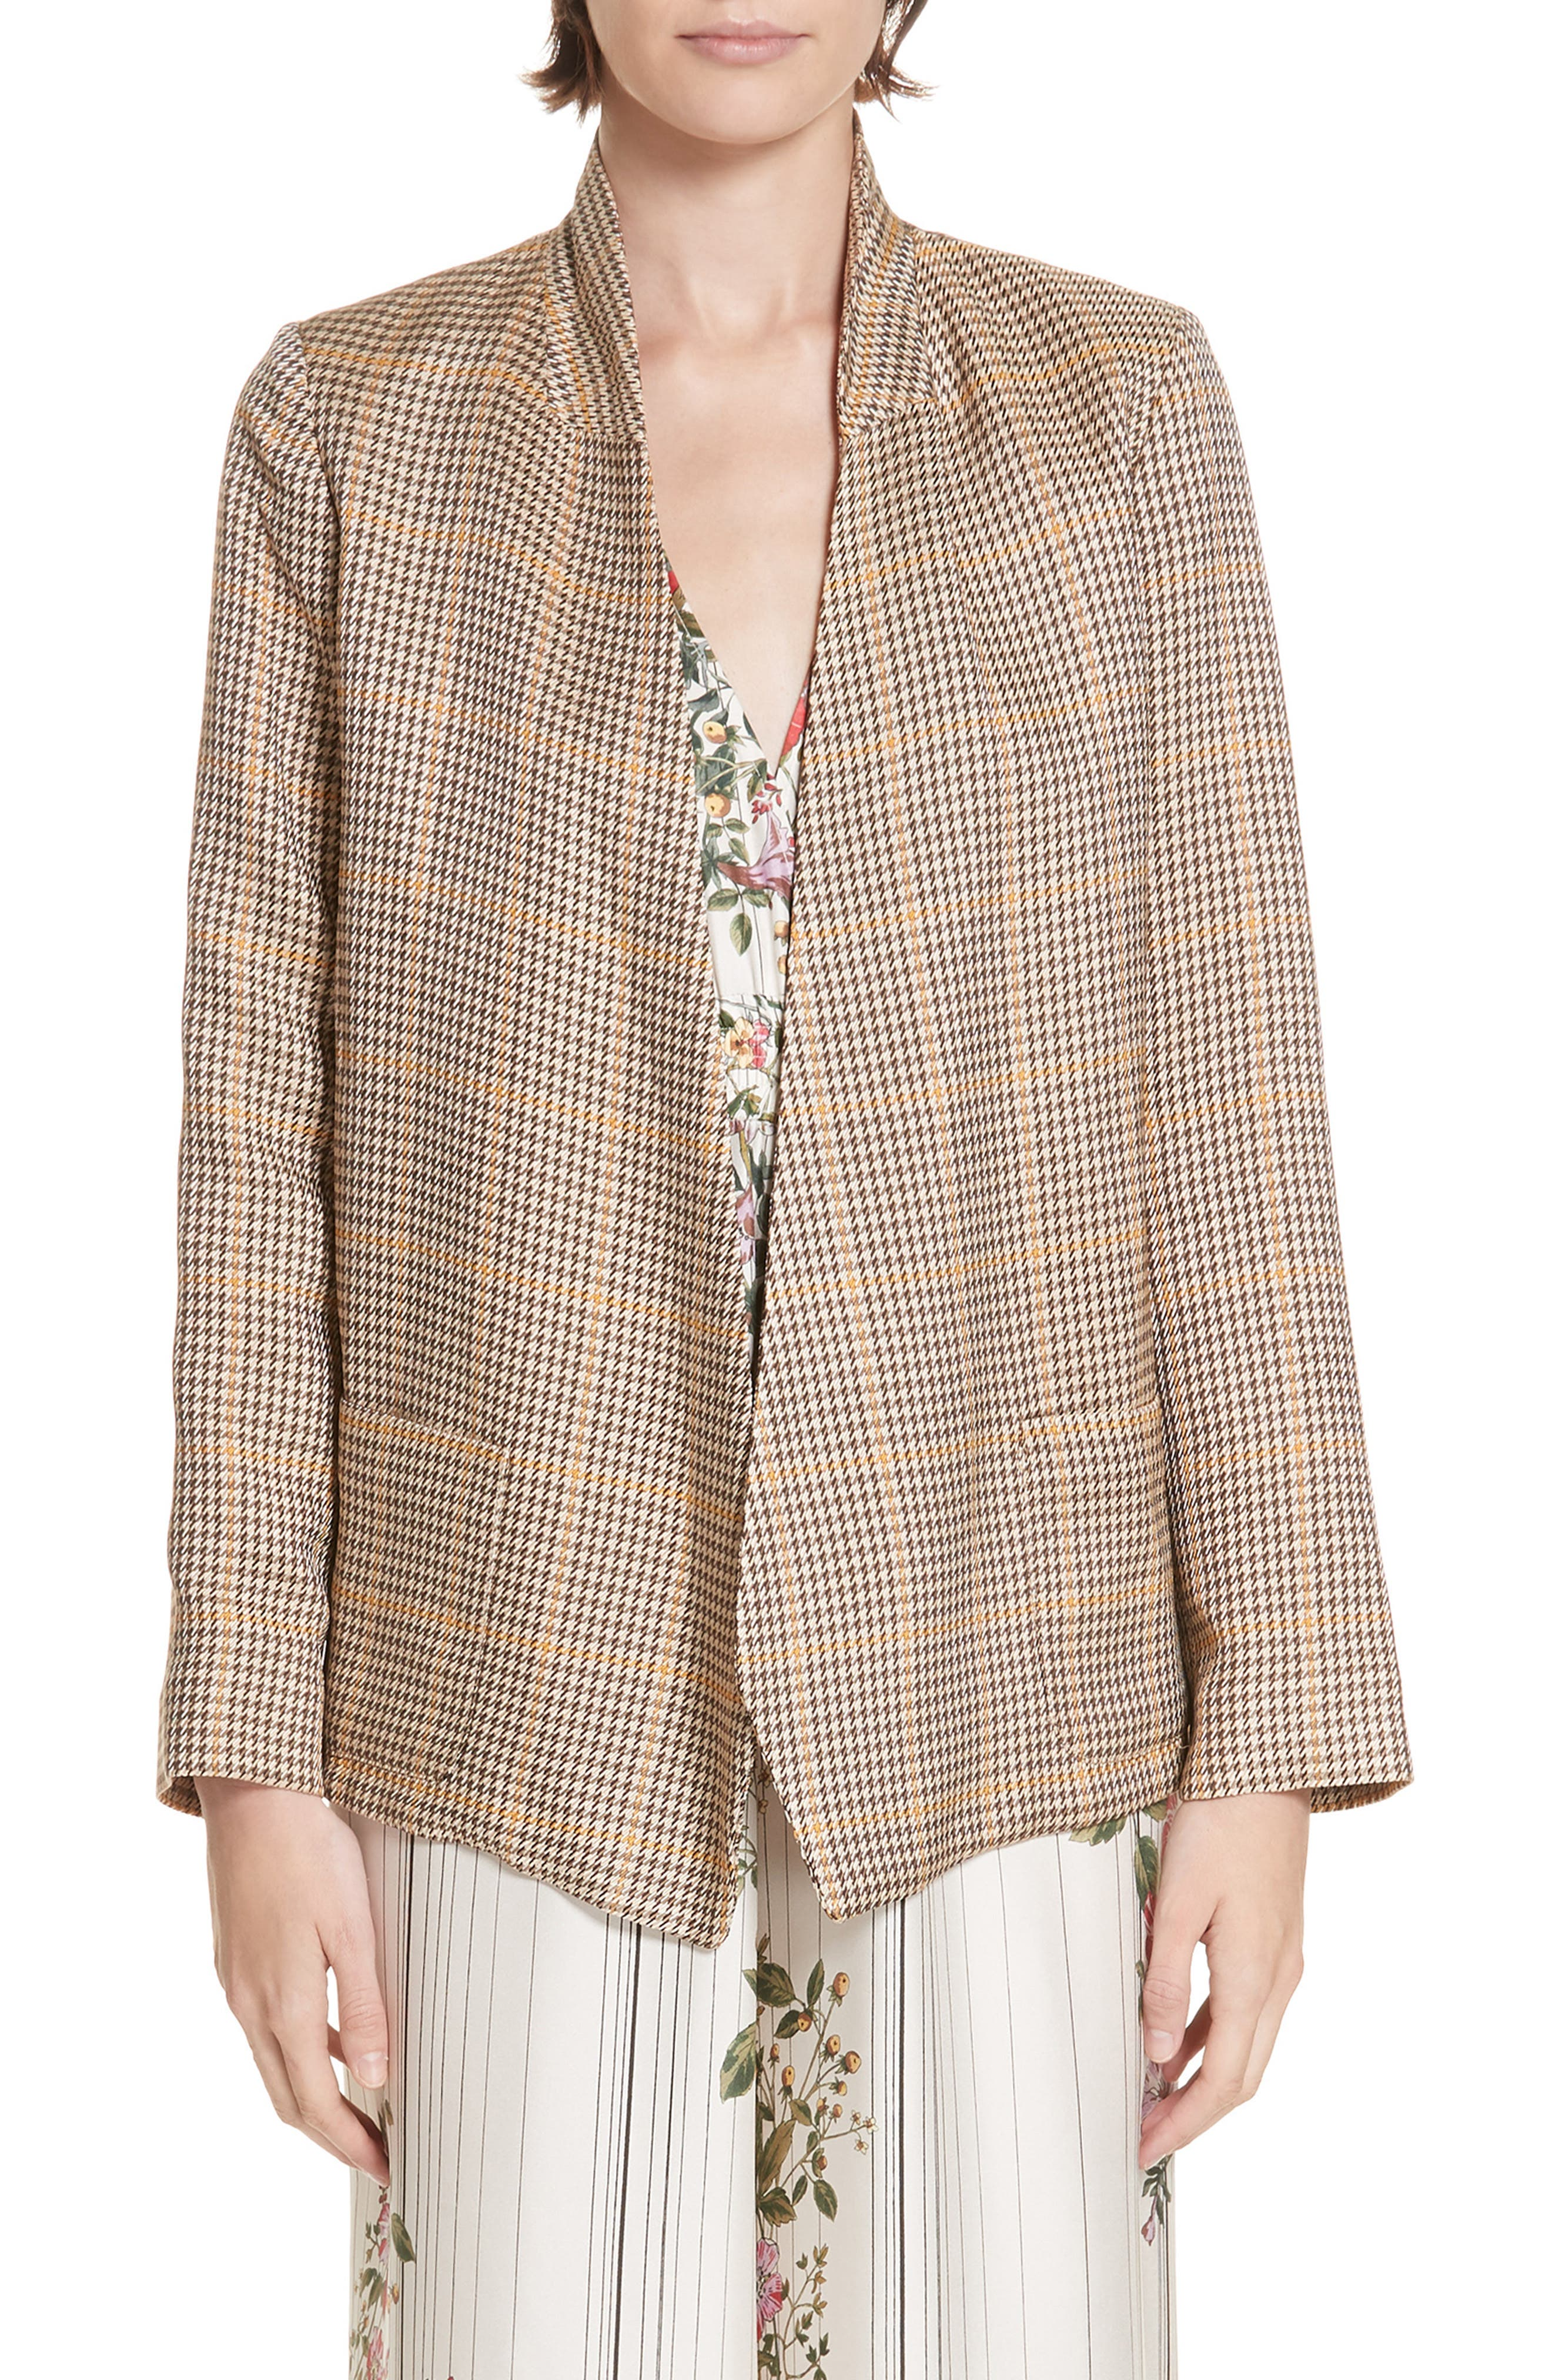 ROSEANNA Tippee Houndstooth Jacket in Multigold